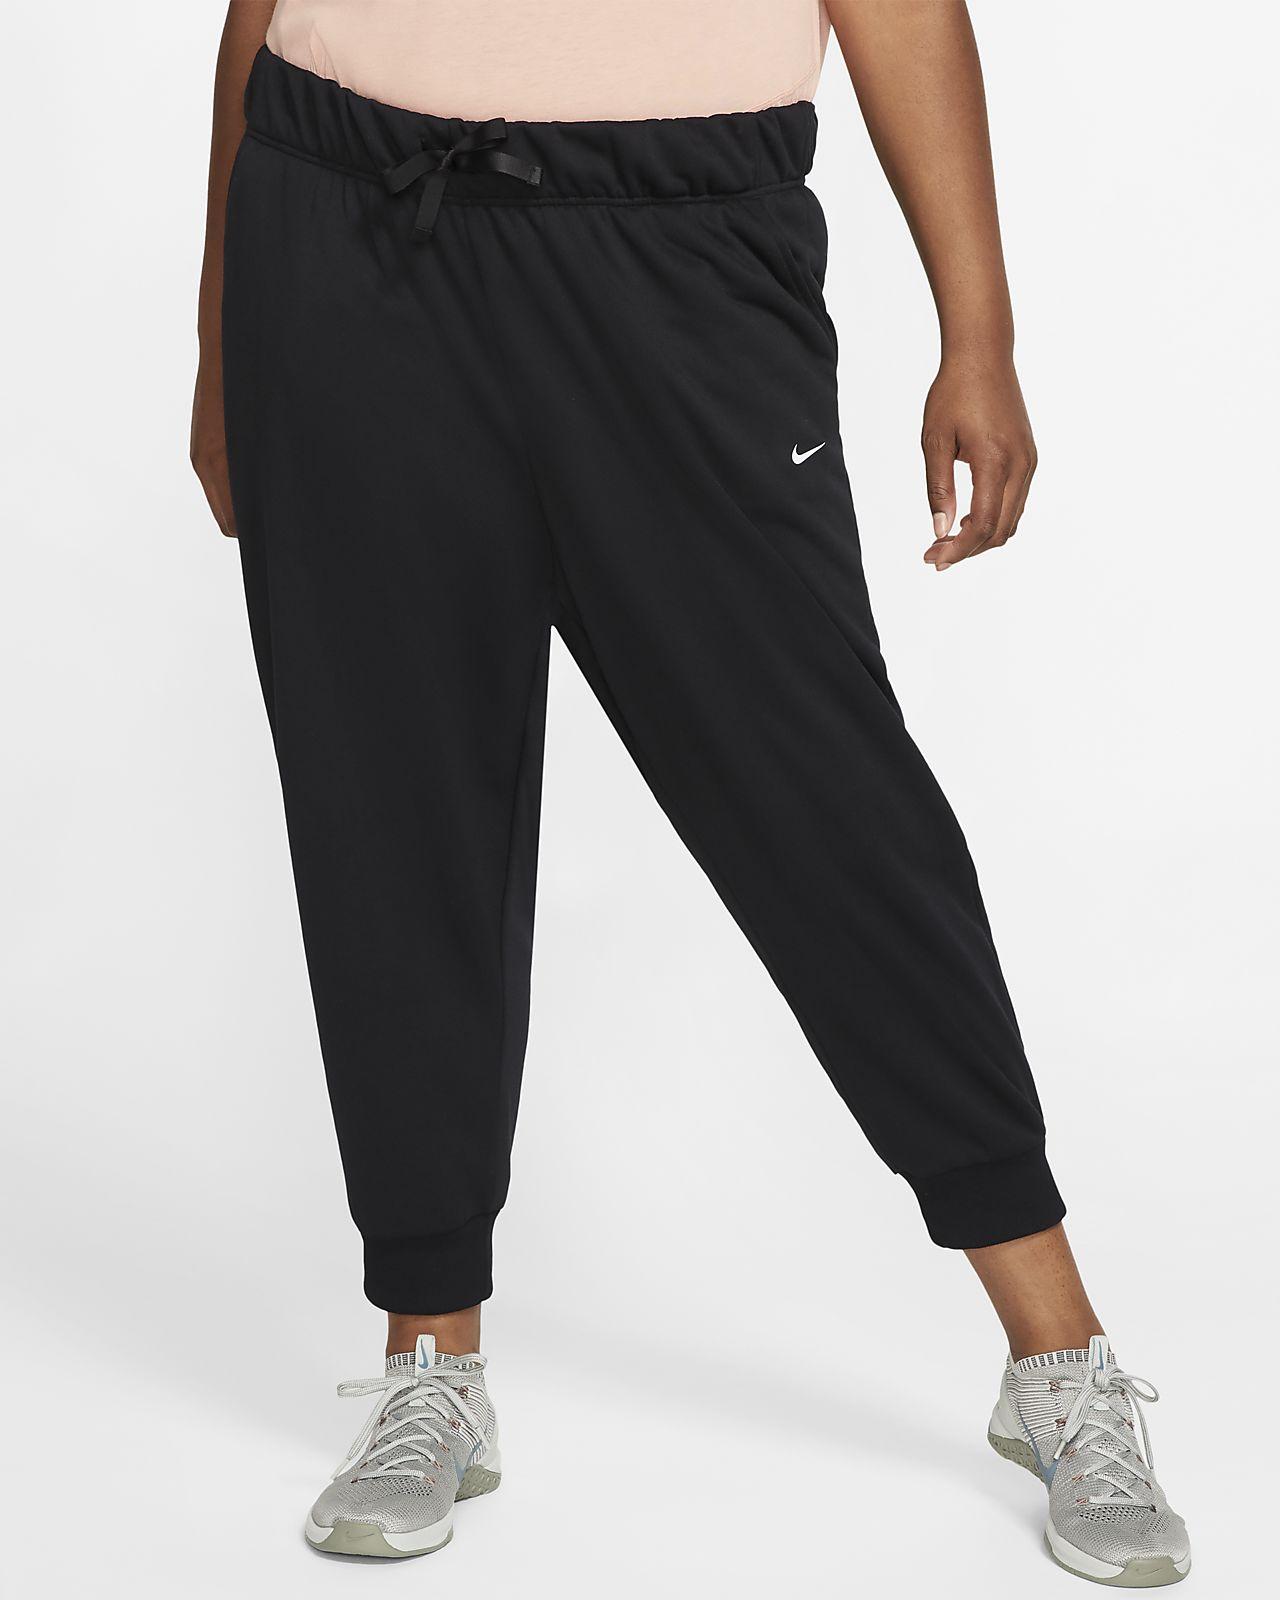 Nike Dri-FIT One Women's Fleece Pants (Plus Size)